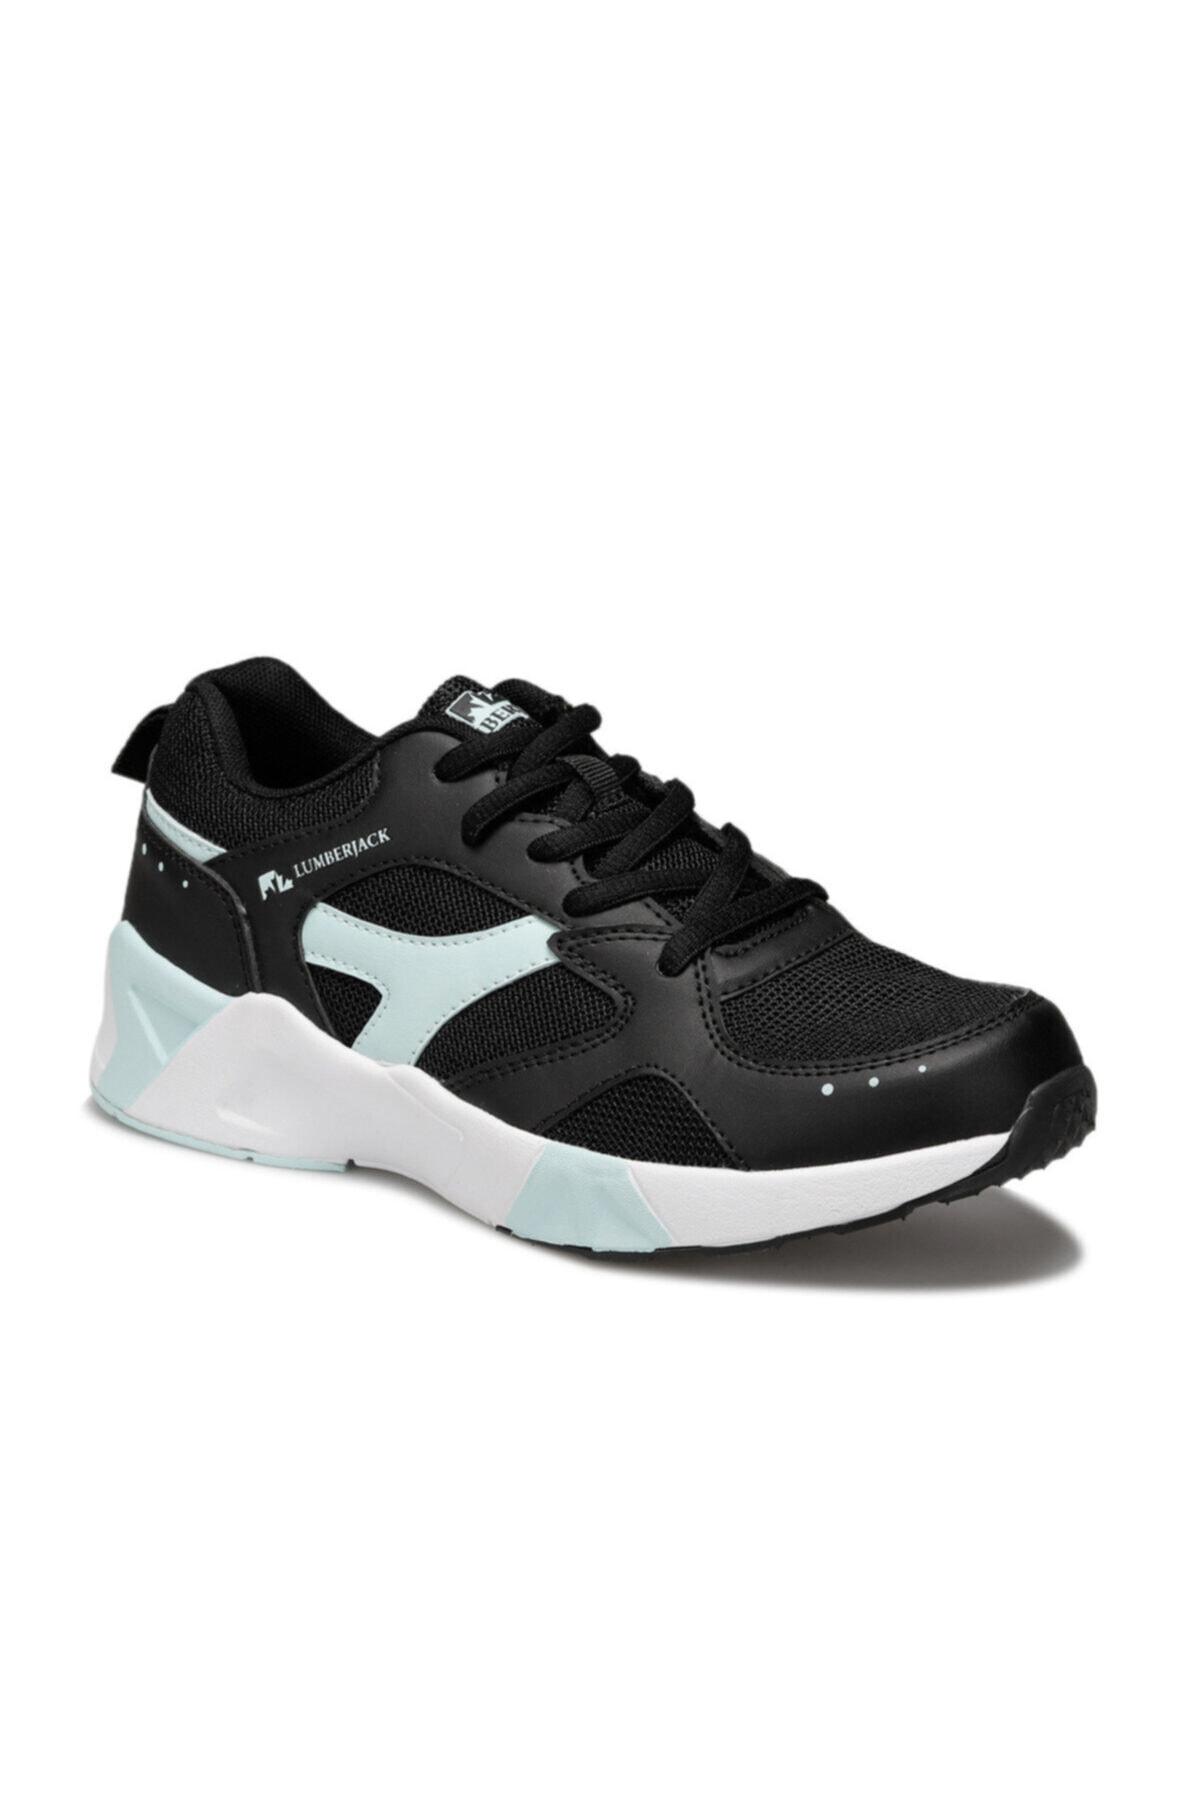 lumberjack Blossom Siyah Kadın Sneaker Ayakkabı 1